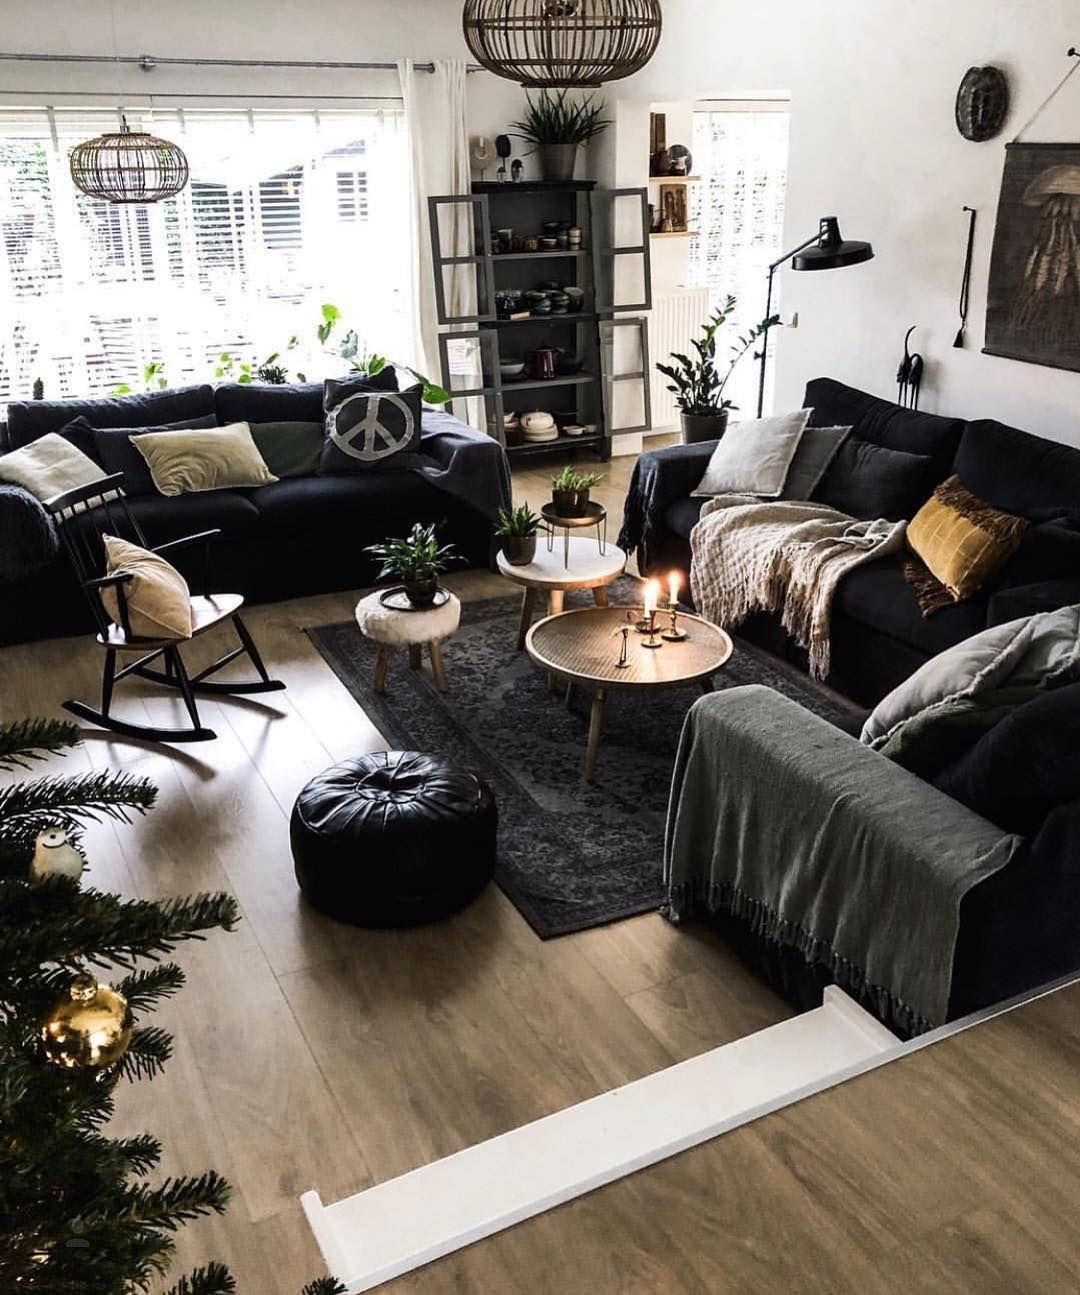 Interior  more on instagram  ccredit een snufje aandacht at home   also simple monochrome yet cosy scandinavian en rh pinterest